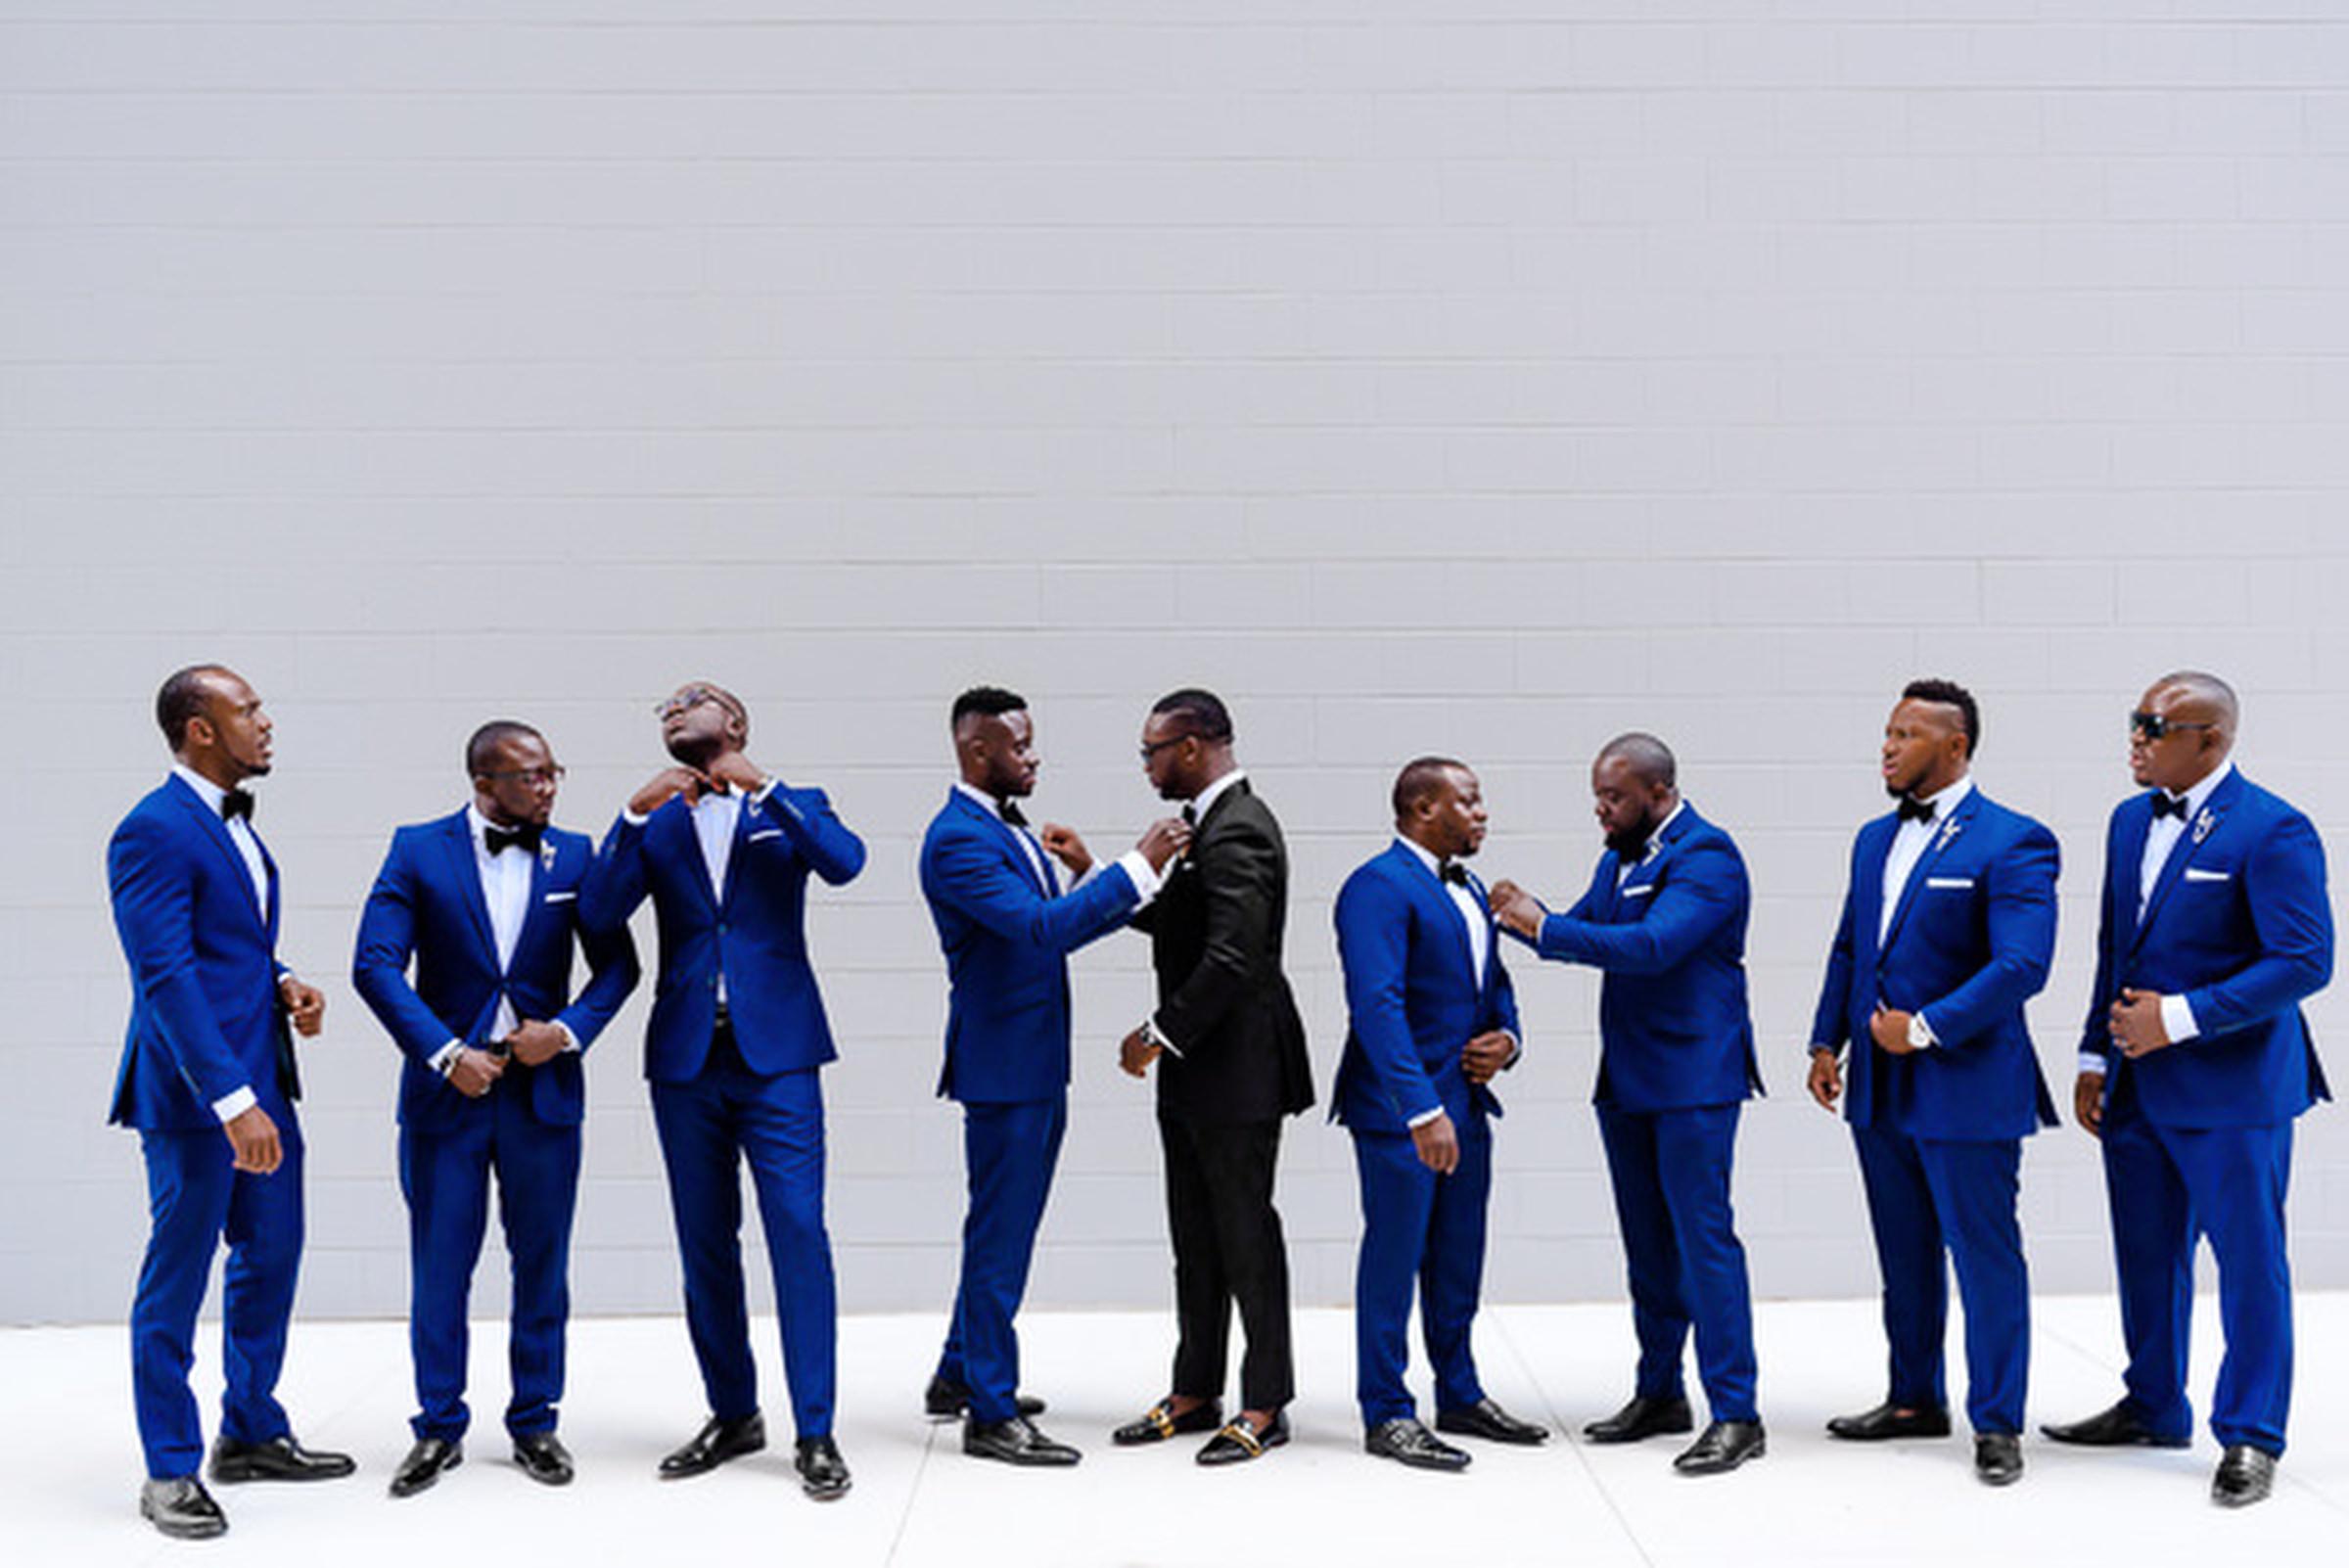 groom-and-groomsmen-primping-kirth-bobb-photography